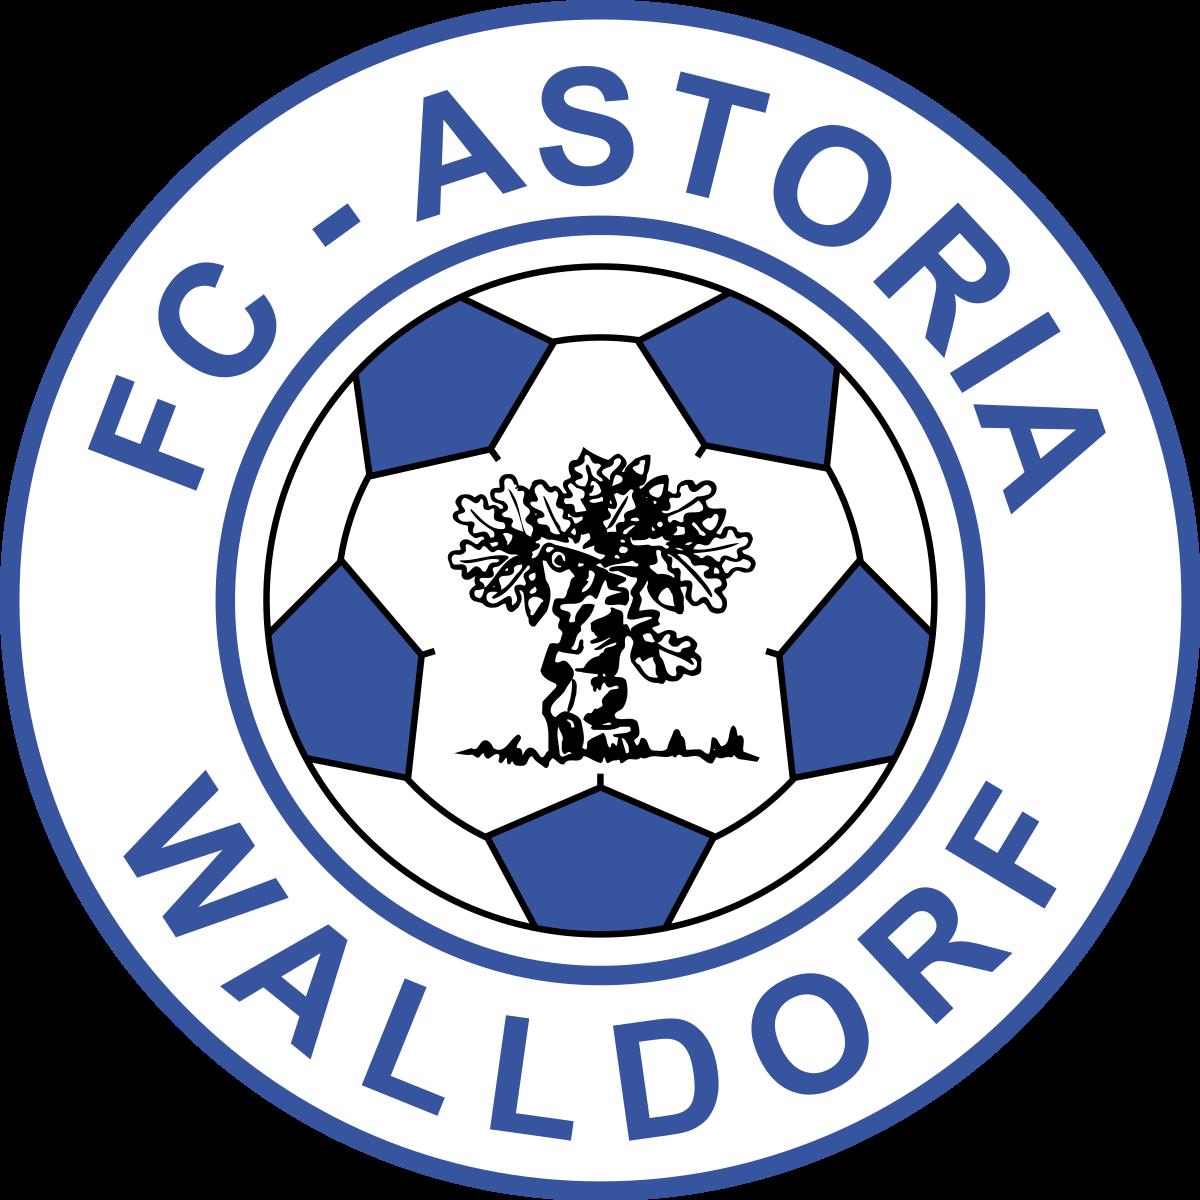 Astoria Walldorf U-19 logo